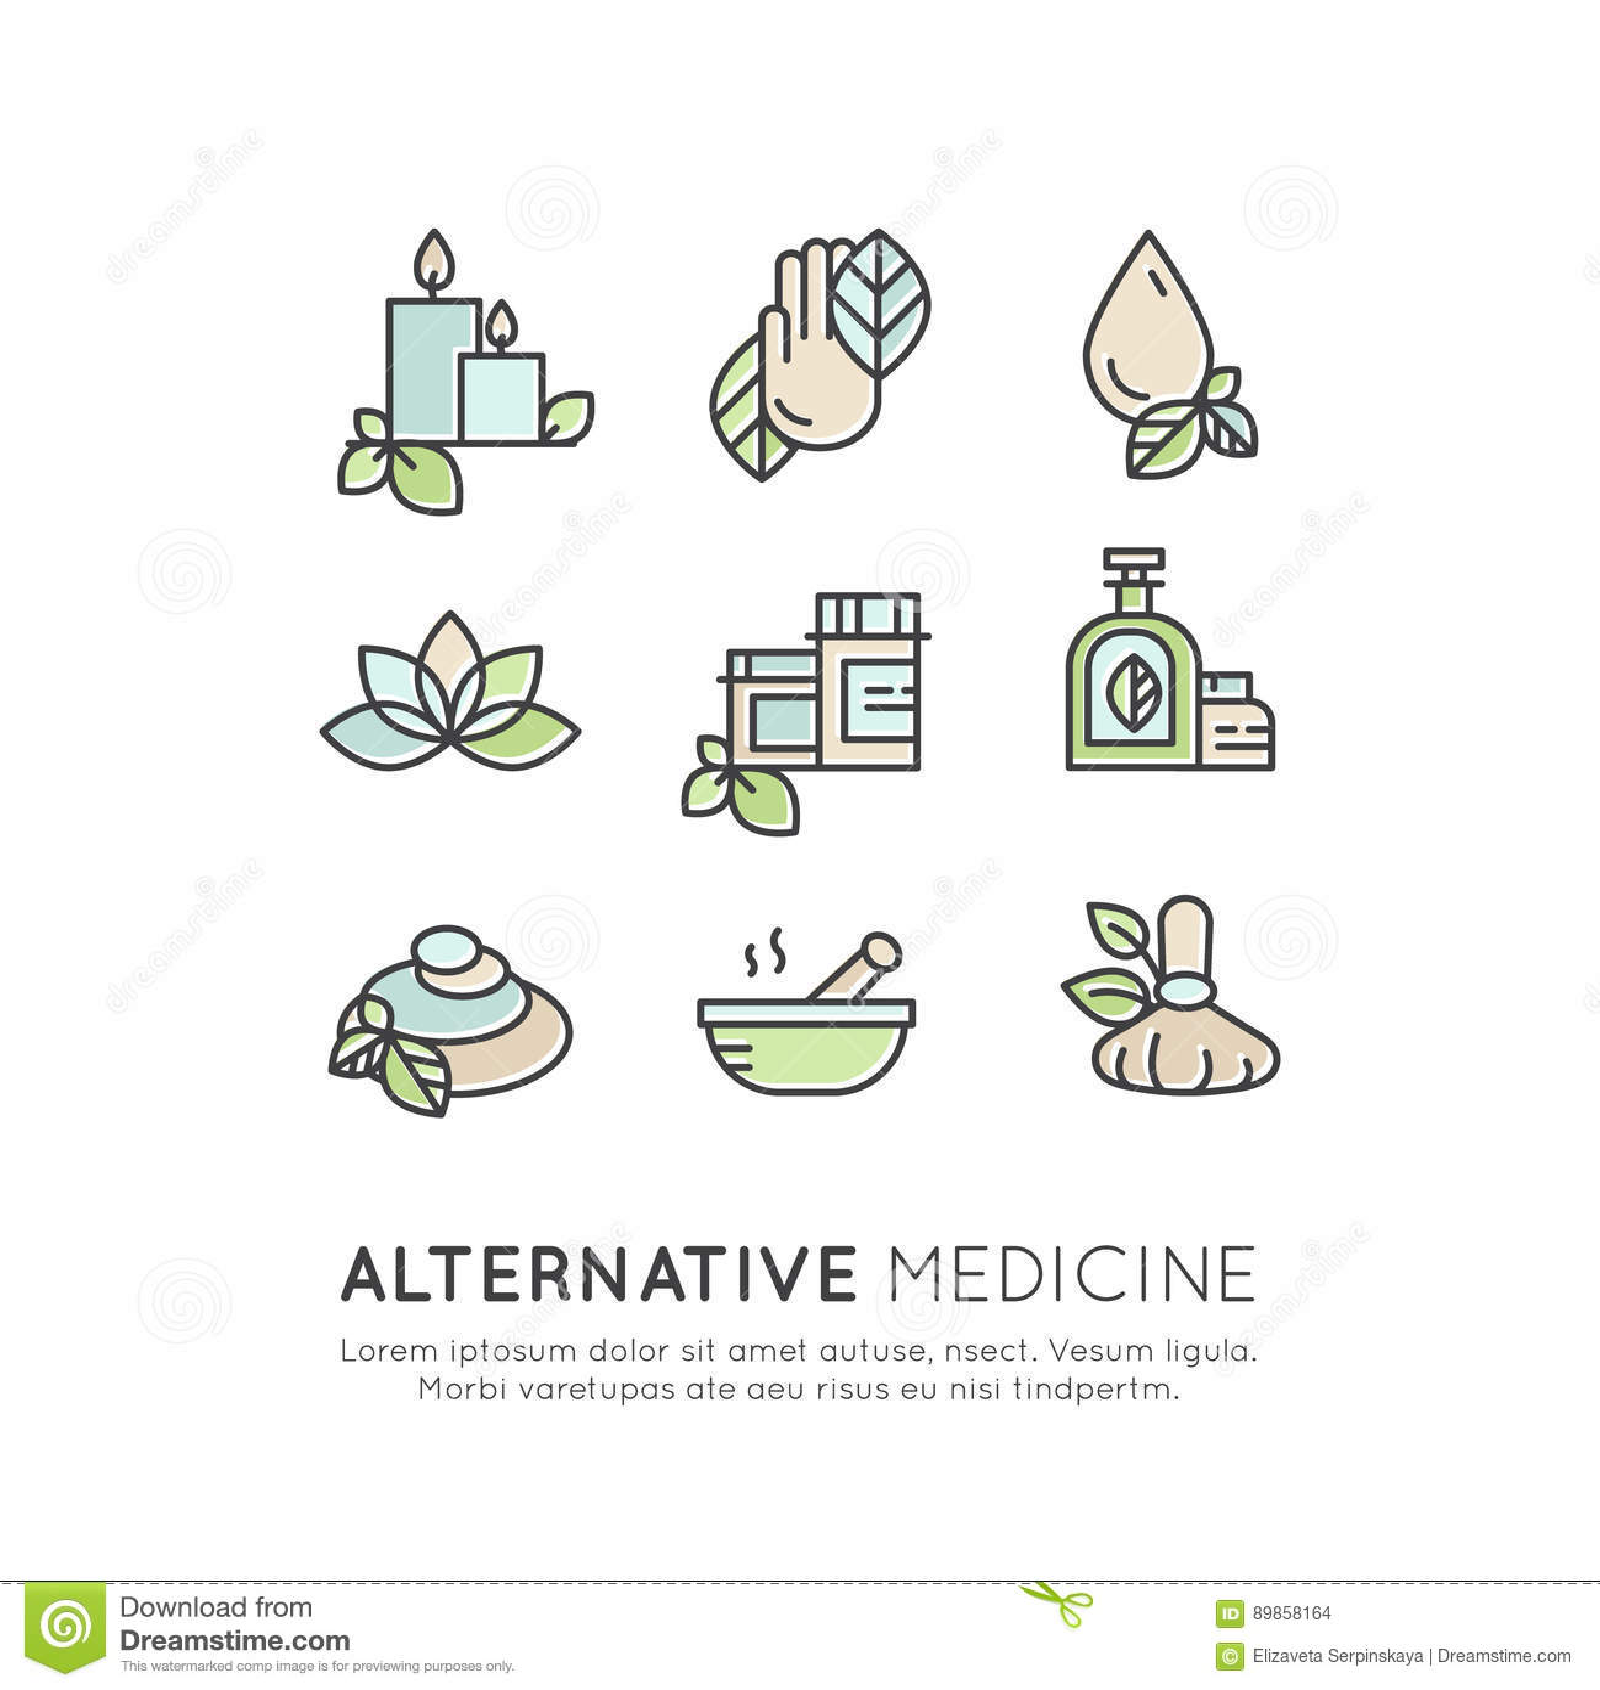 Alternatieve geneeskunde IV Vitaminetherapie, anti-Veroudert, Wellness, Ayurveda, Chinese Geneeskunde Holistic centrum